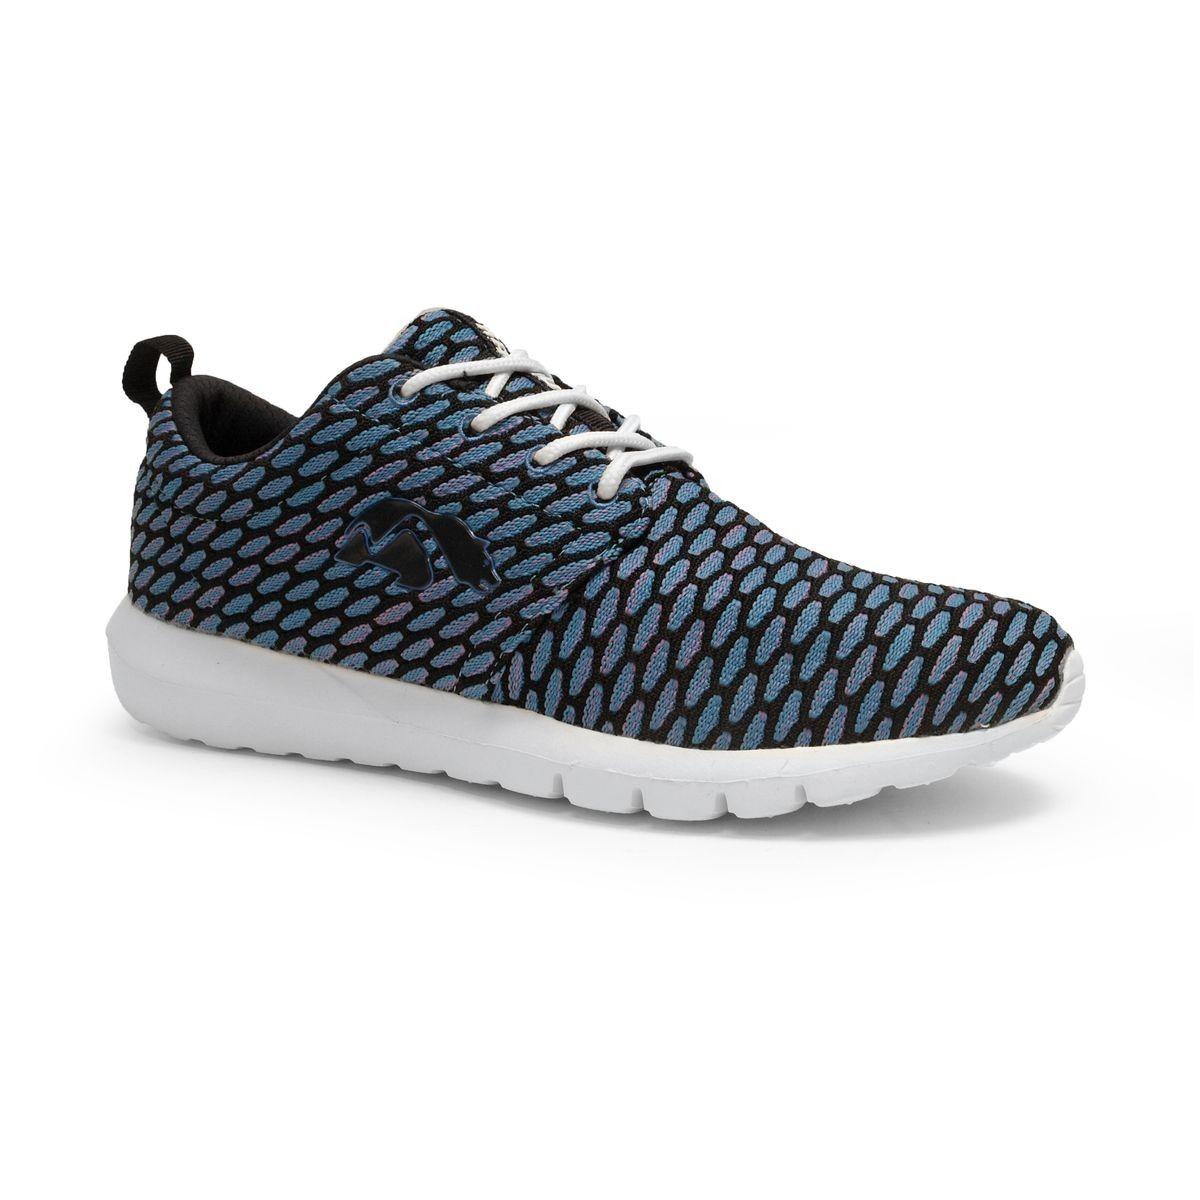 Sneakers Karhu Beron 6BGloKjWZY